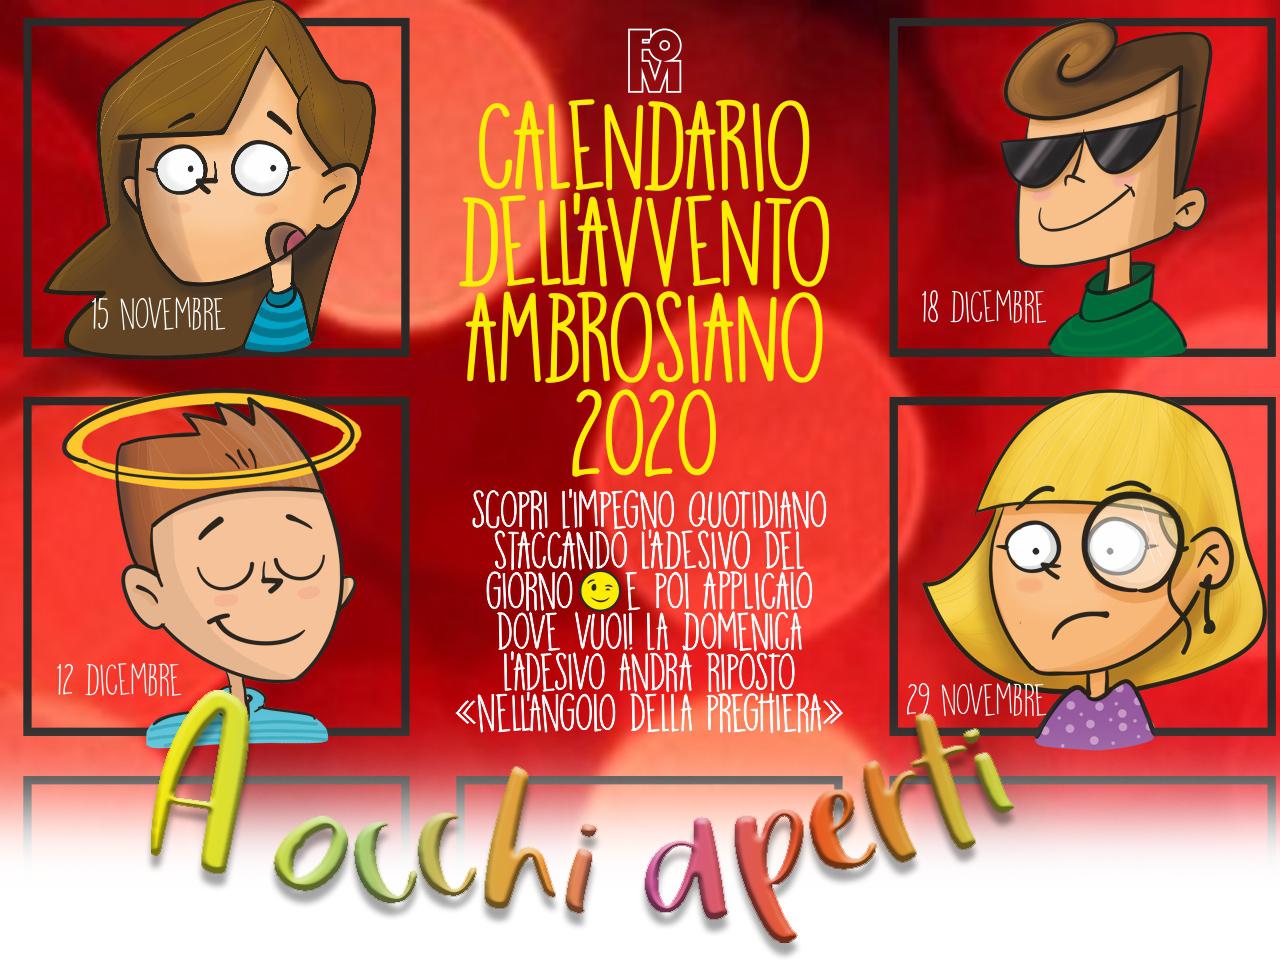 calendario-avvento-ambrosiano-2020